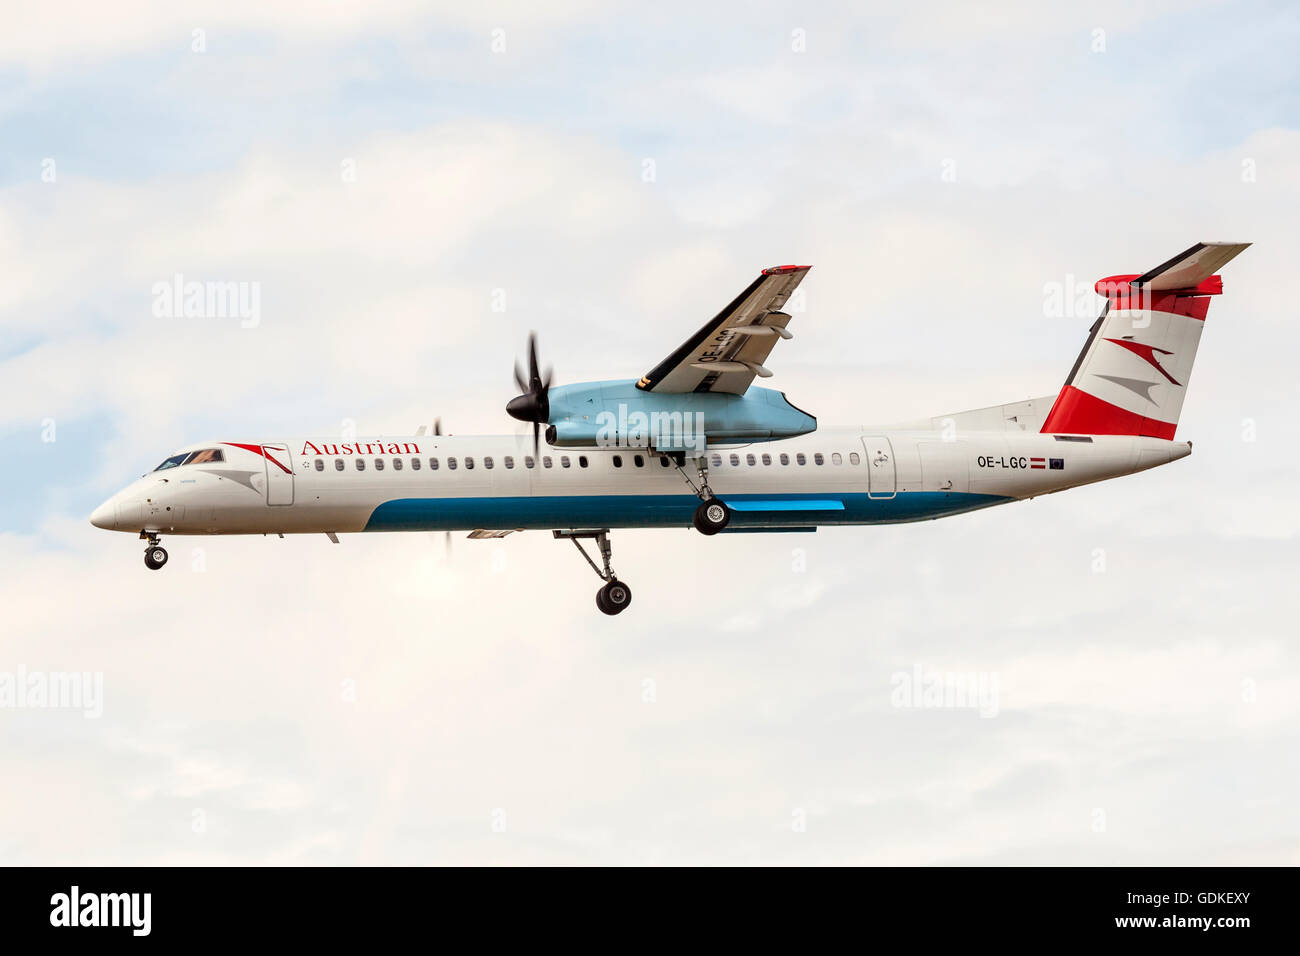 Austrian Airlines Bombardier Dash 8 - Stock Image